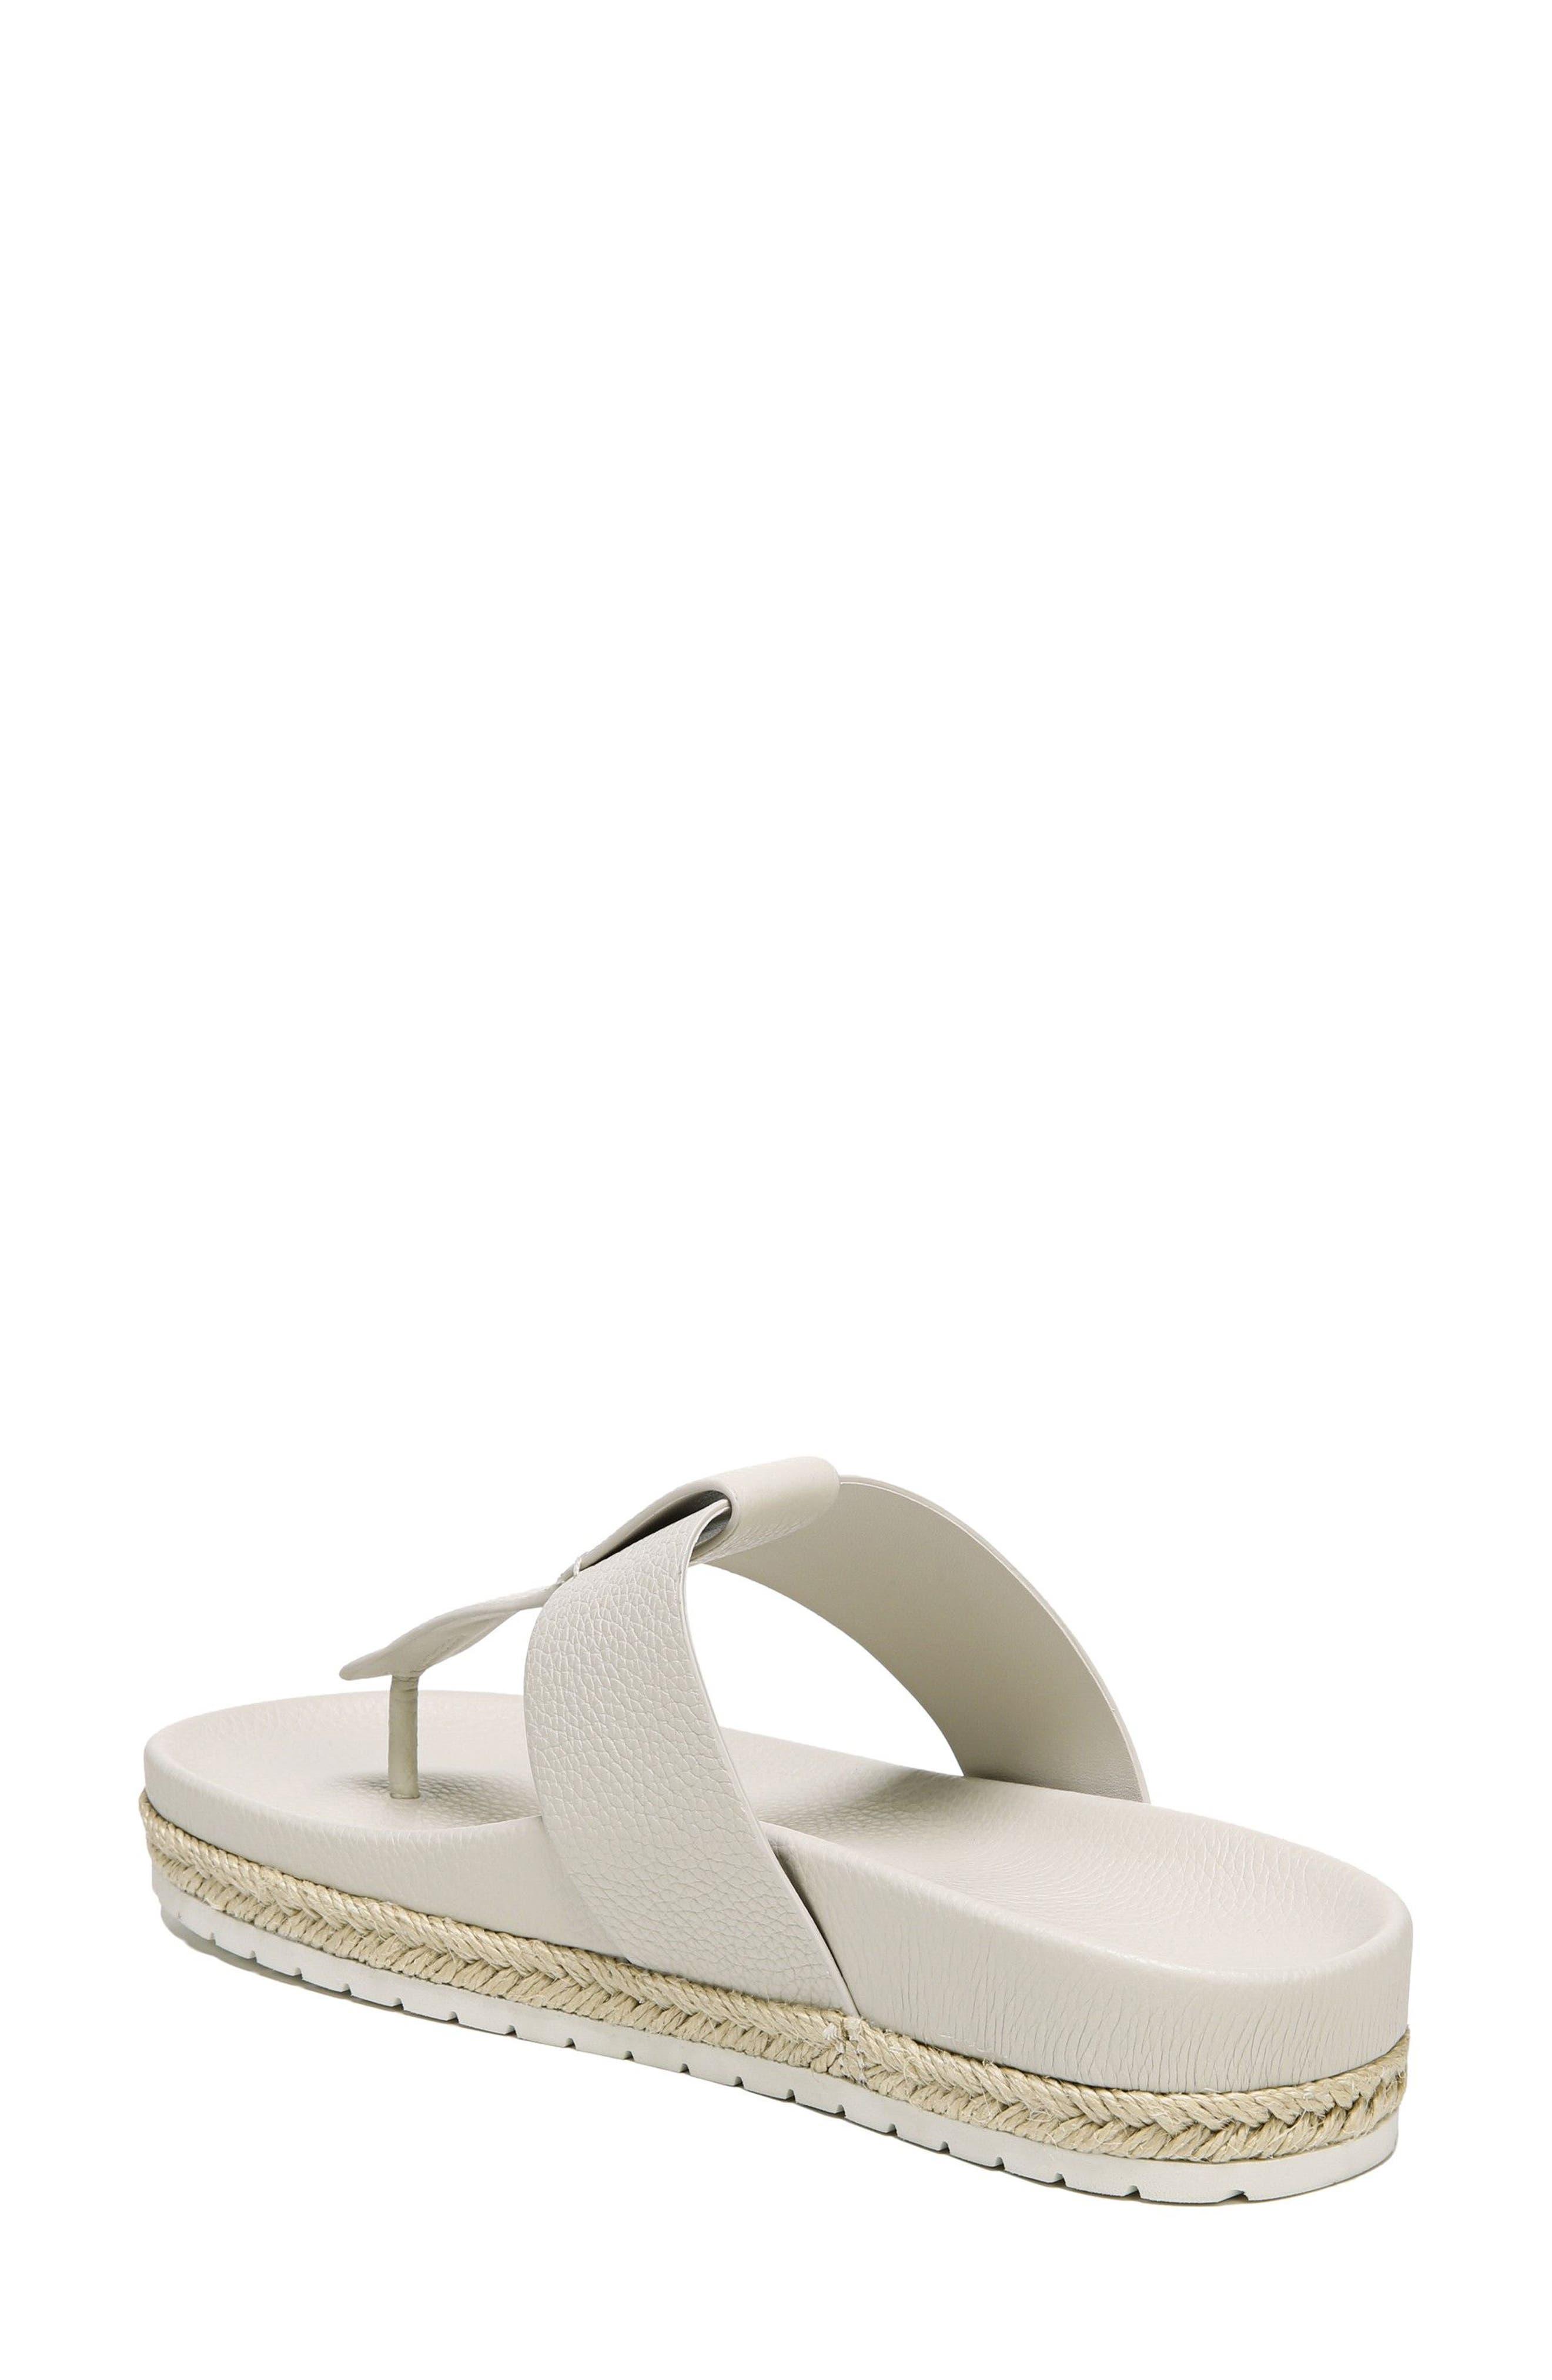 Avani T-Strap Flat Sandal,                             Alternate thumbnail 2, color,                             Oyster